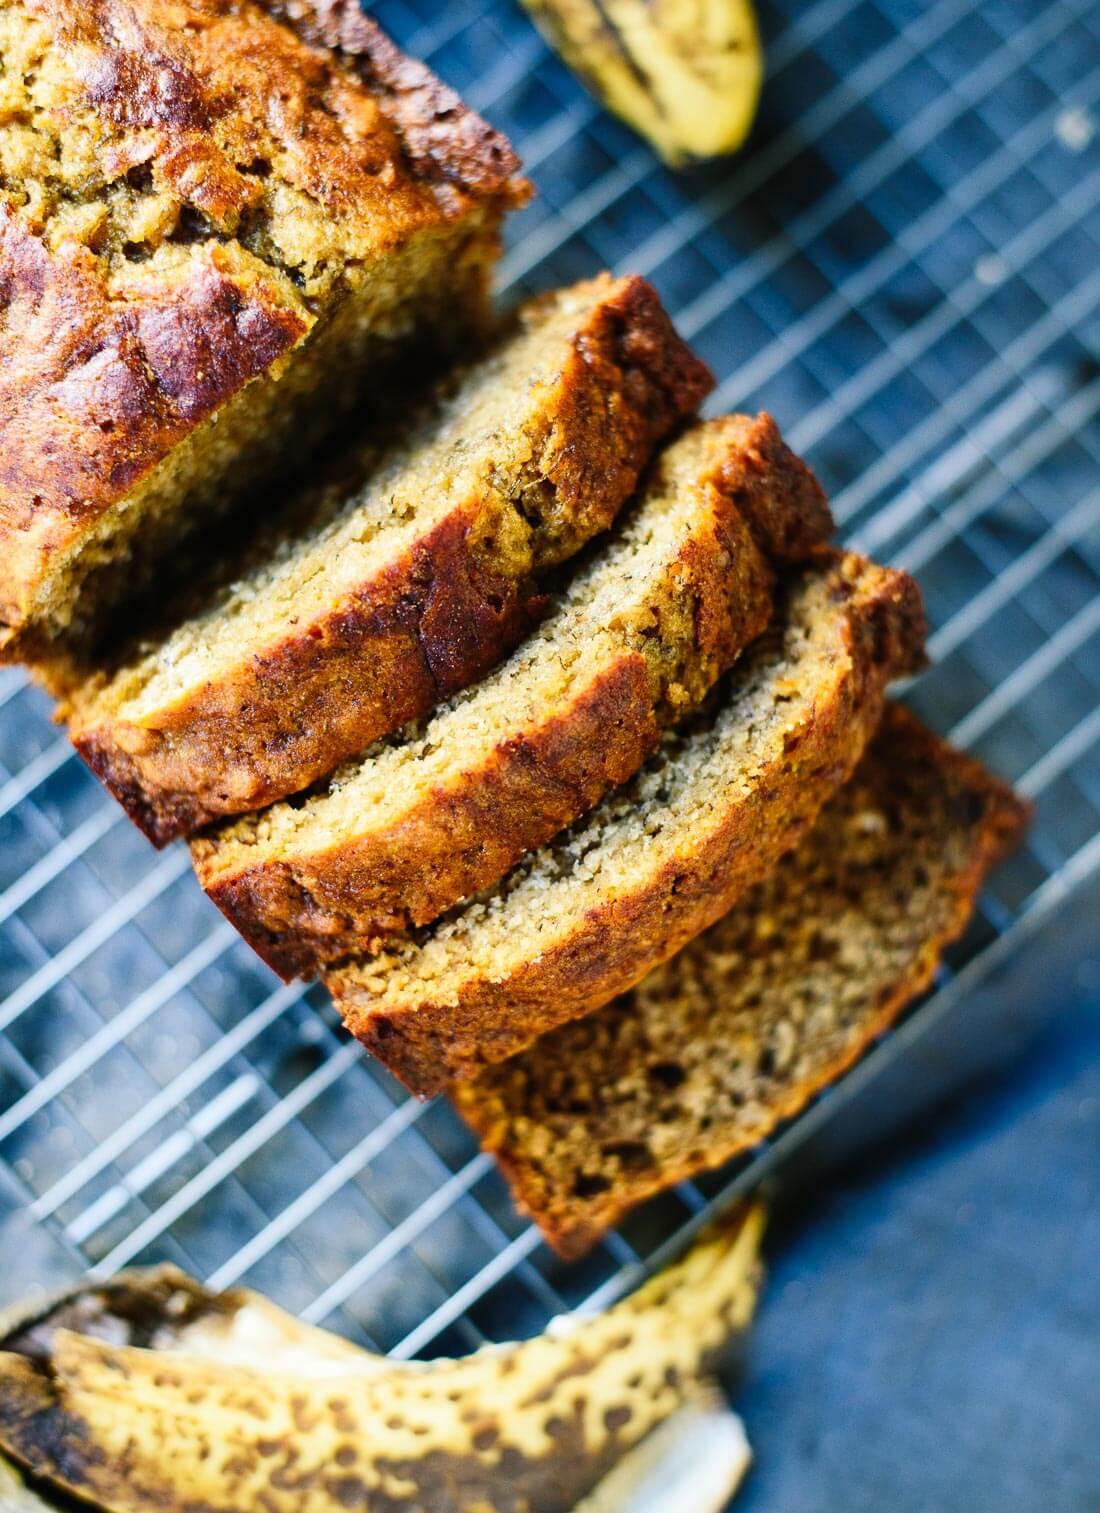 Banana Bread Healthy  Healthy Banana Bread Recipe Cookie and Kate